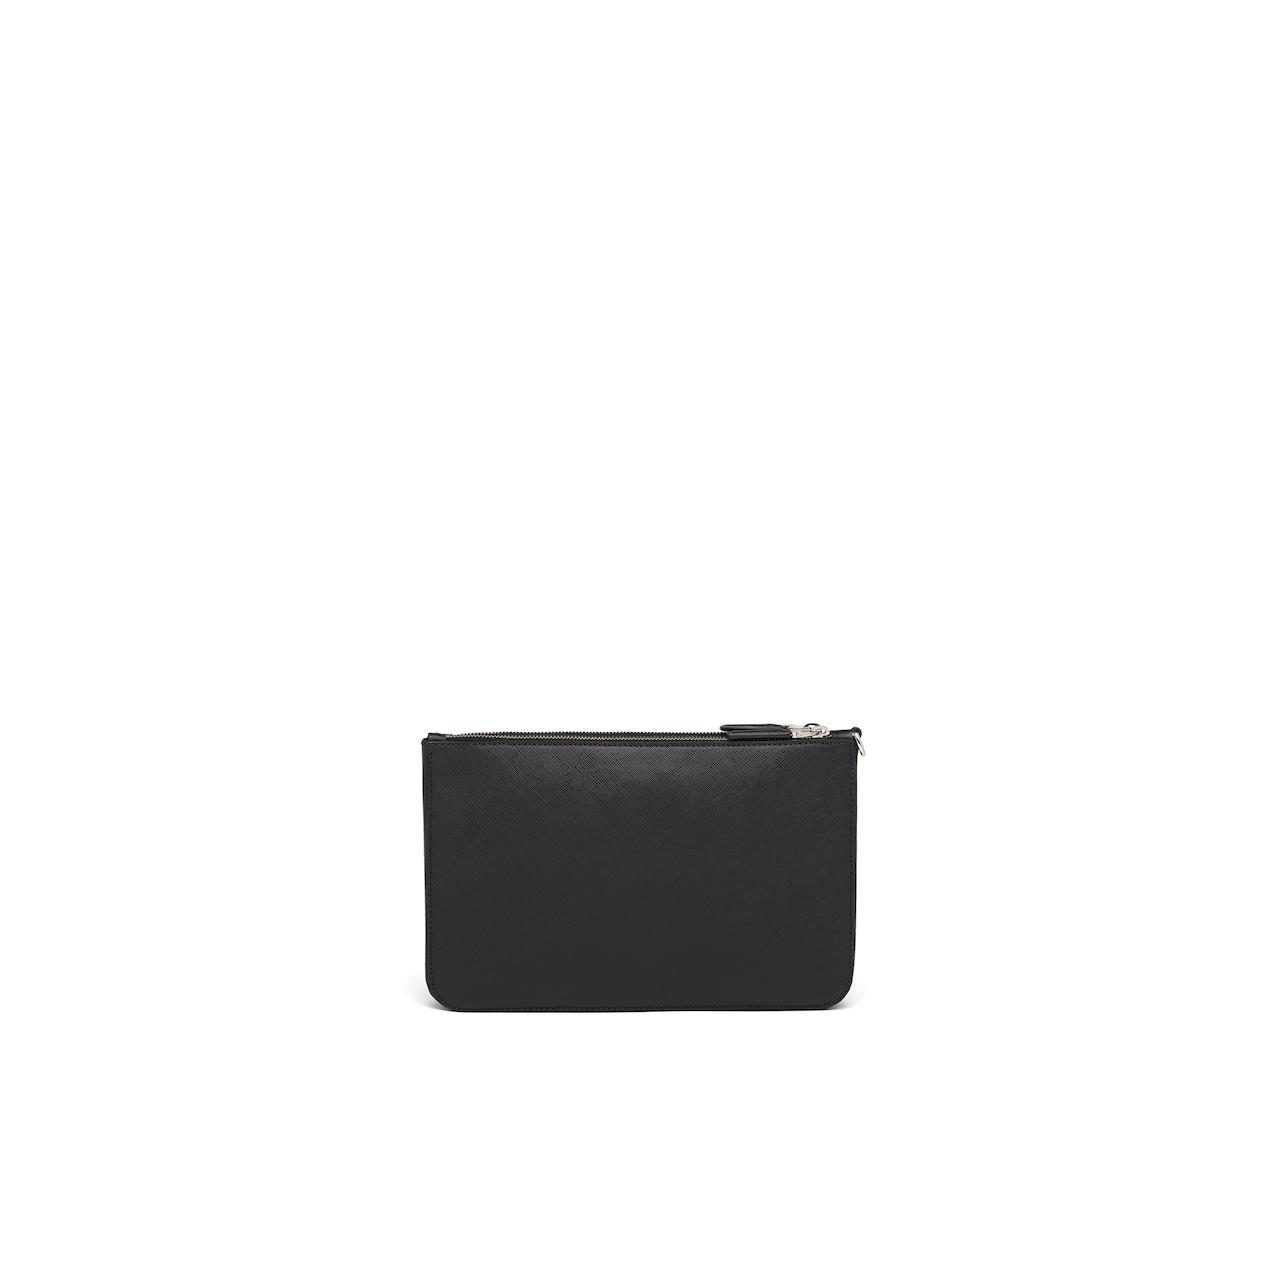 Prada Saffiano Leather Clutch 4